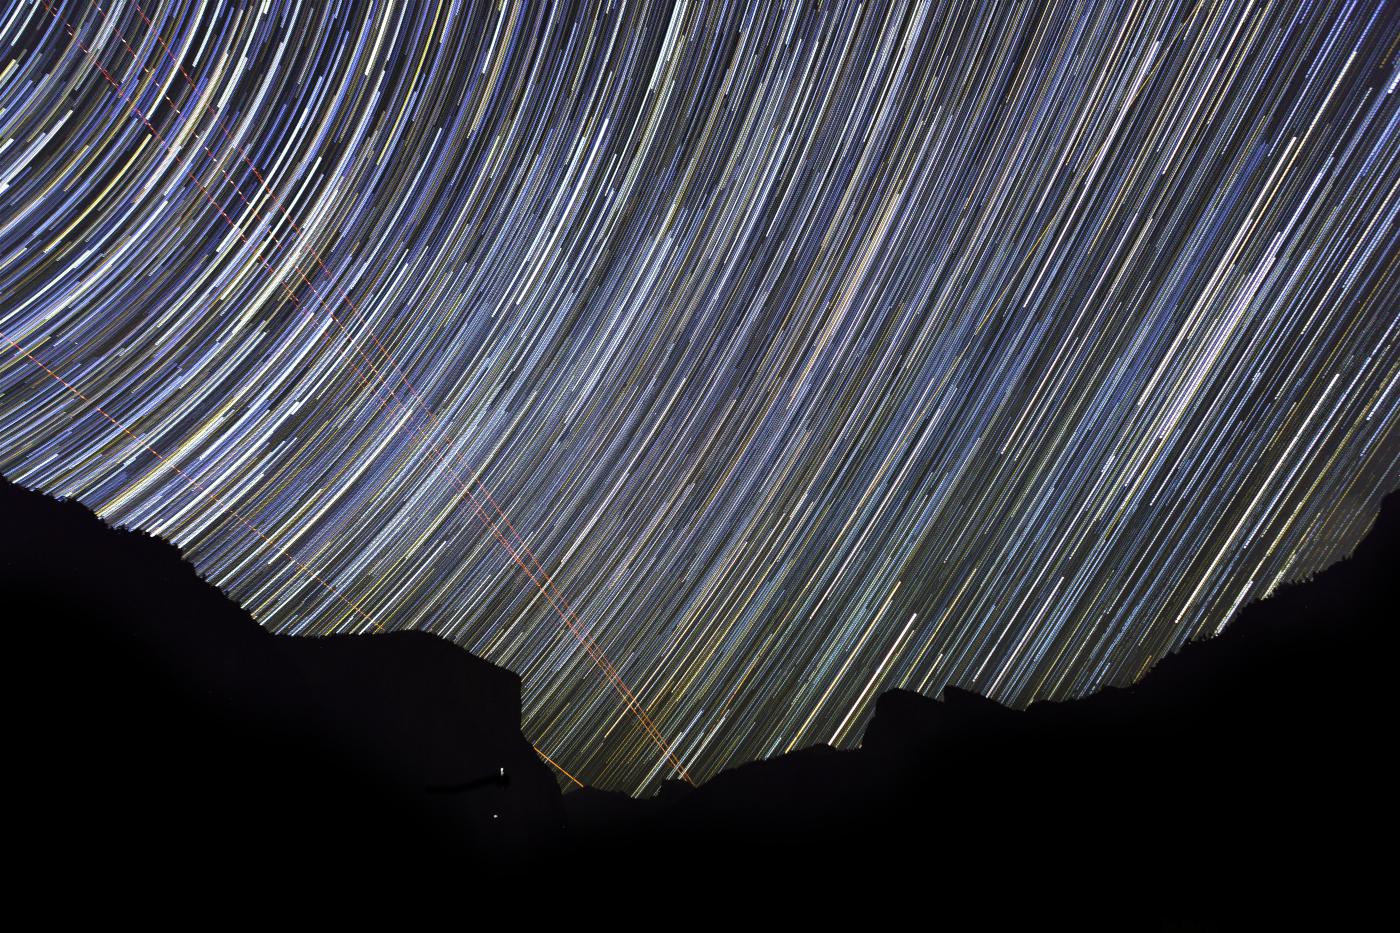 Star trails at Yosemite National Park in northern California. Credit: Jonathan Irish